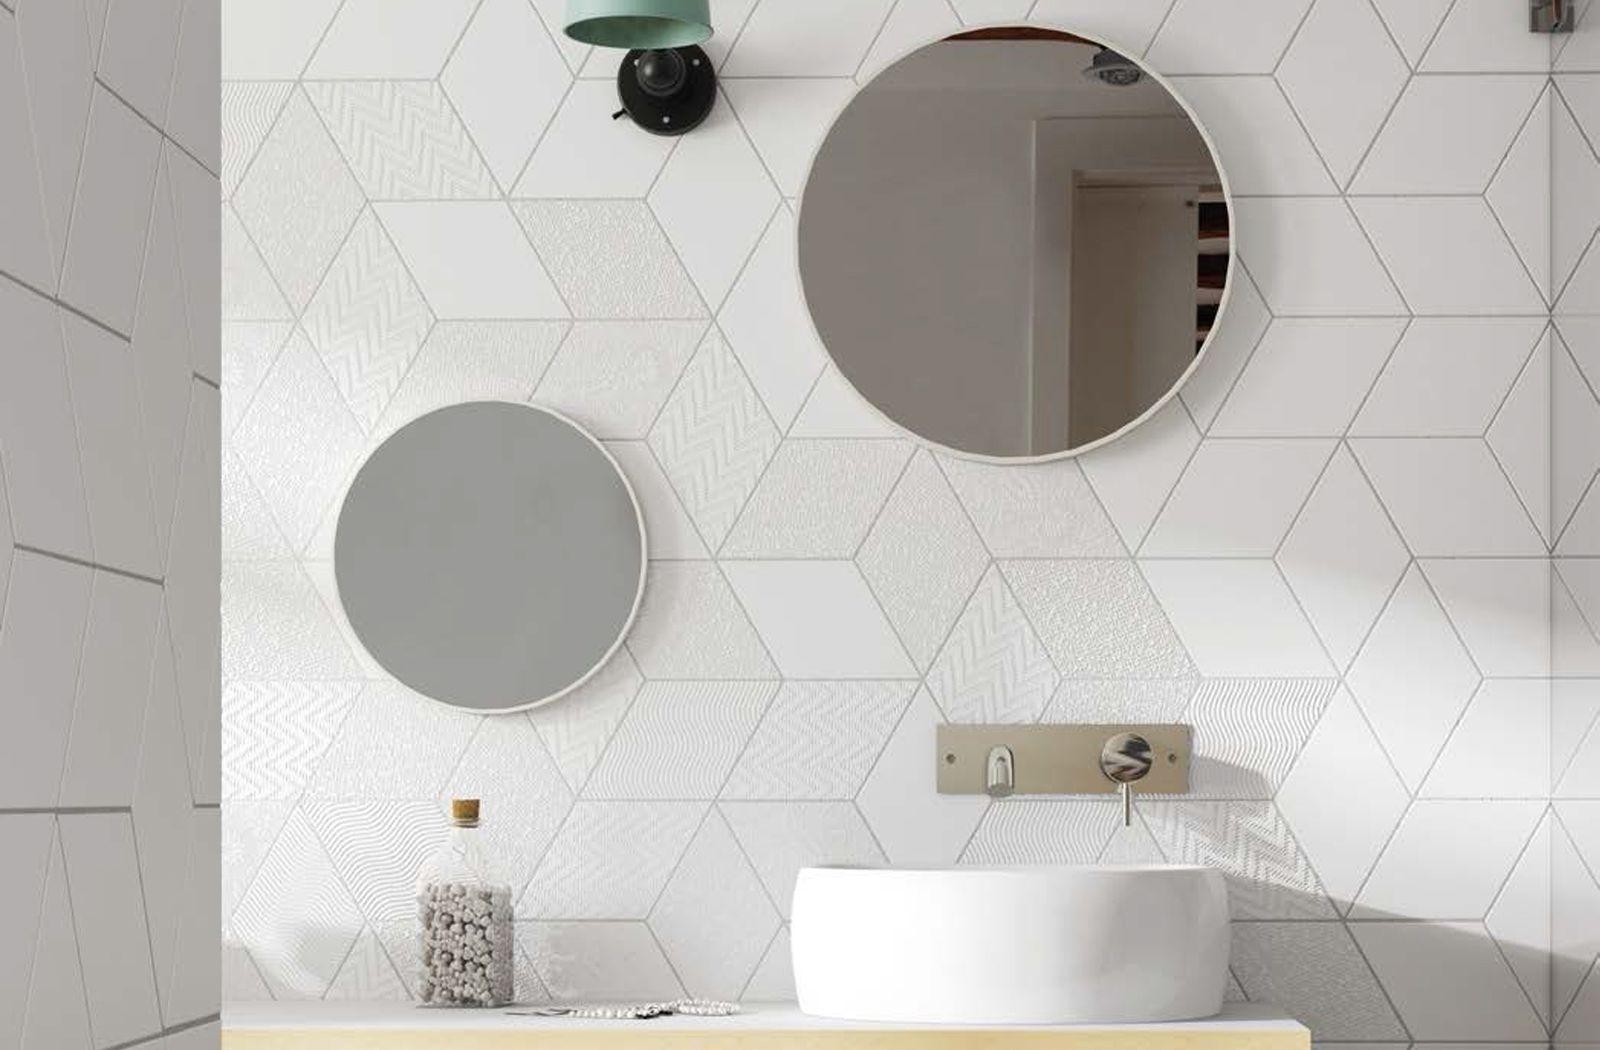 Pin By Faith On Interior Designs Bathroom Wall Tile Rhombus Tile Round Mirror Bathroom